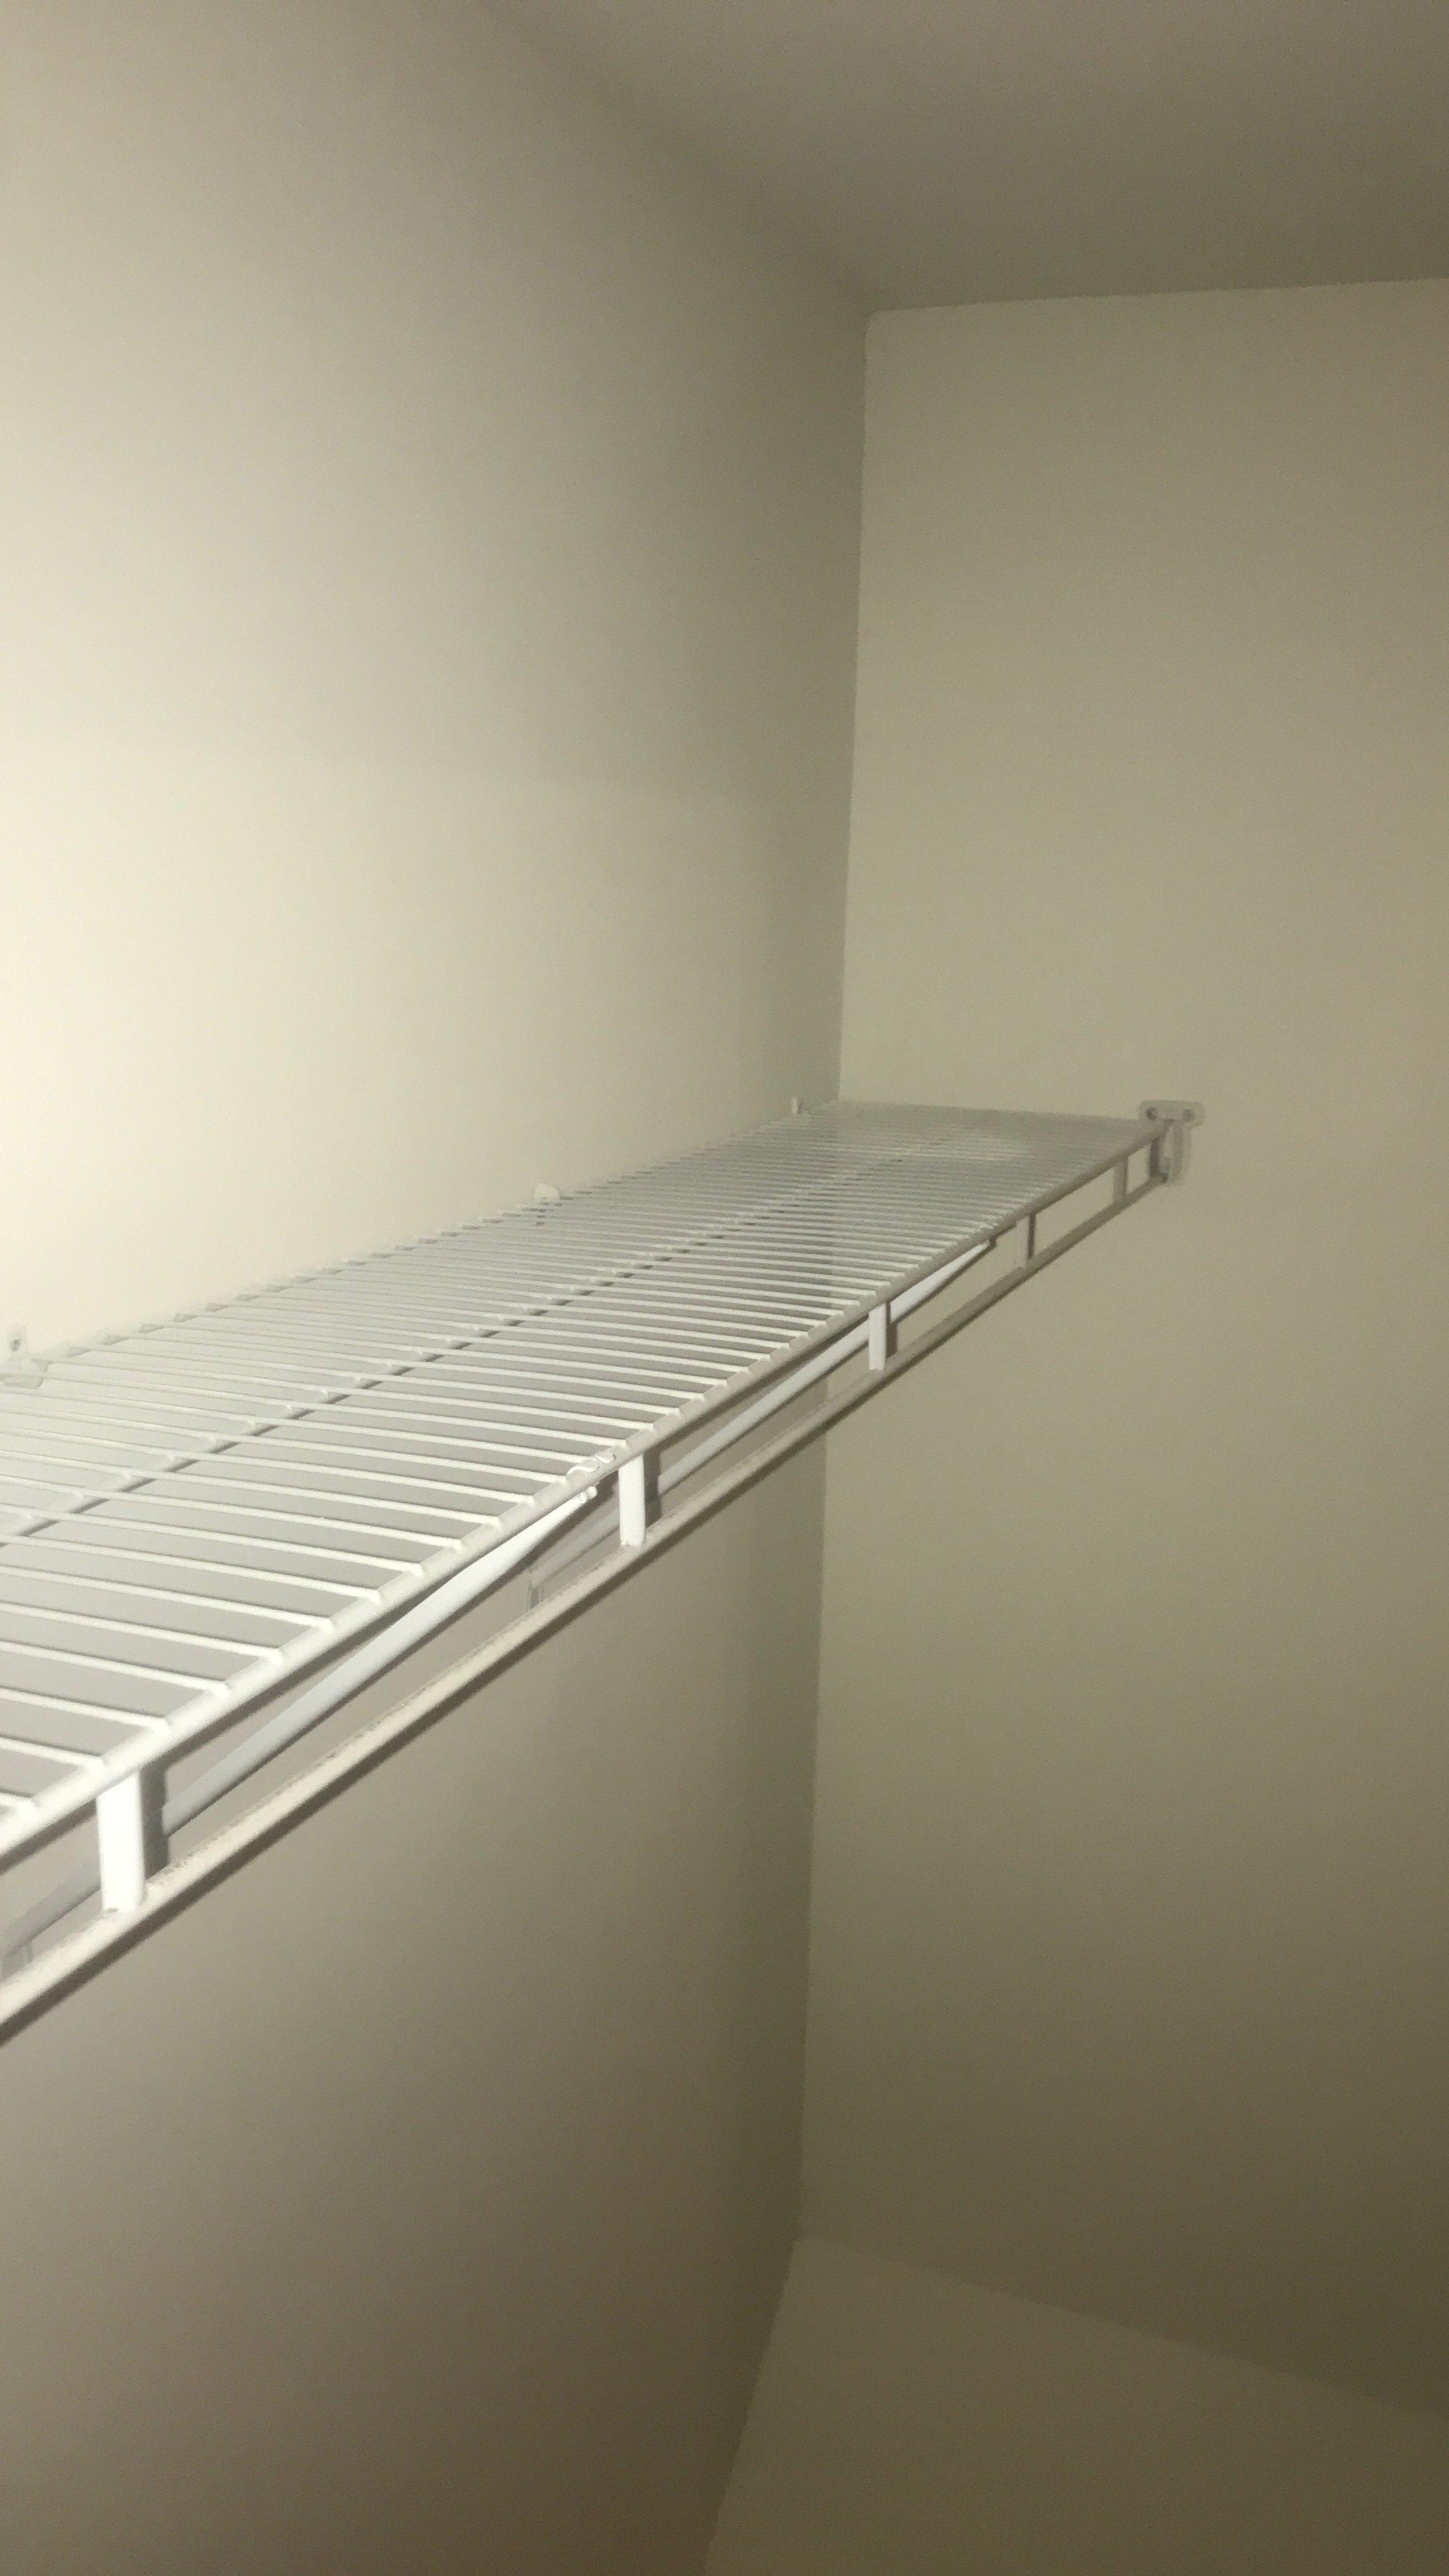 3x5 Closet self storage unit